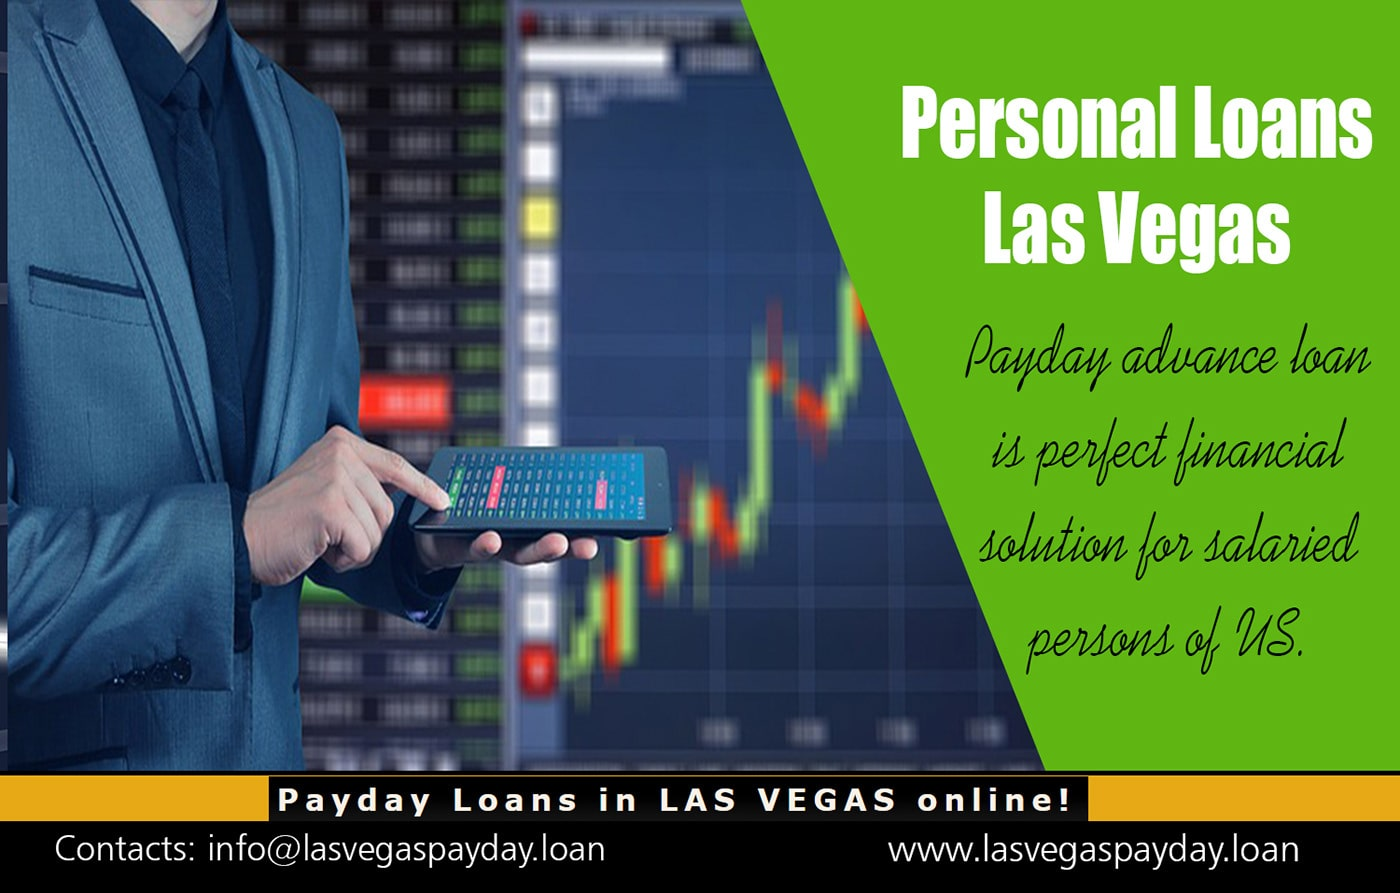 Las Vegas Personal Loans Online